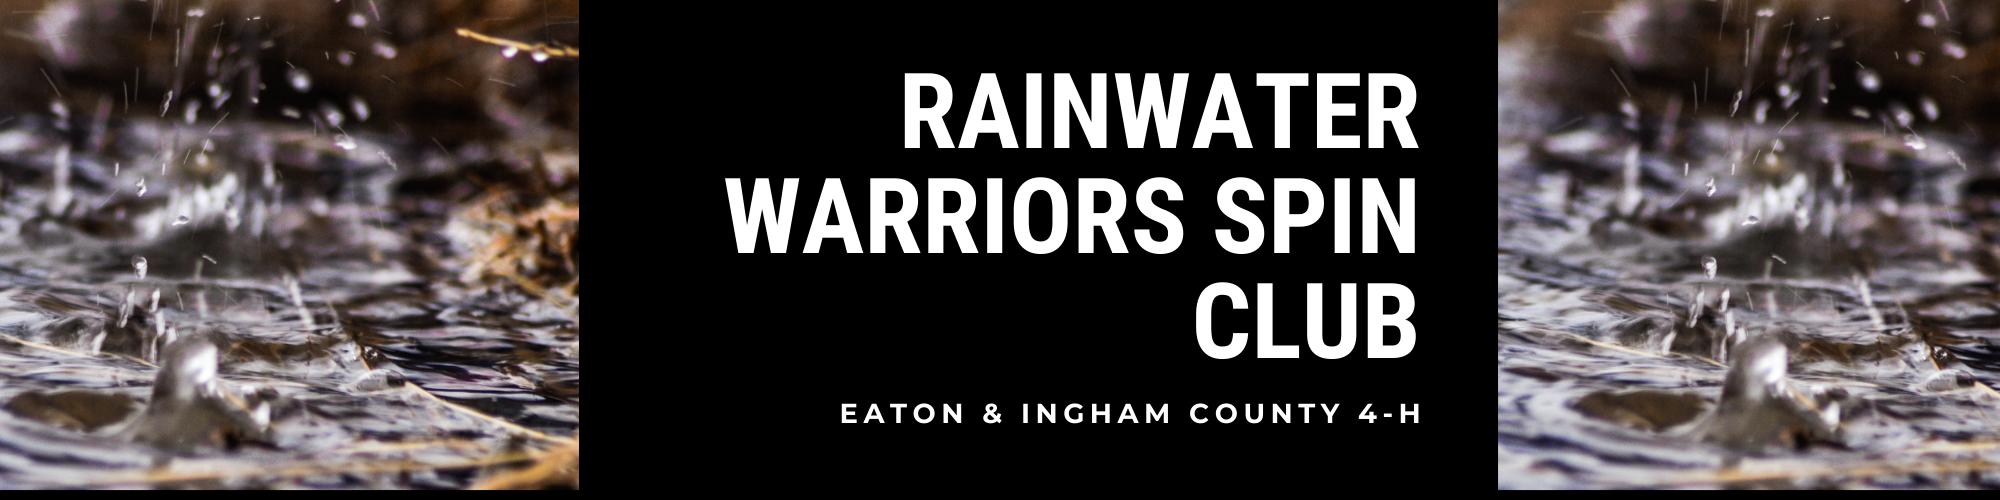 4-H Rainwater Warriors SPIN Club logo.